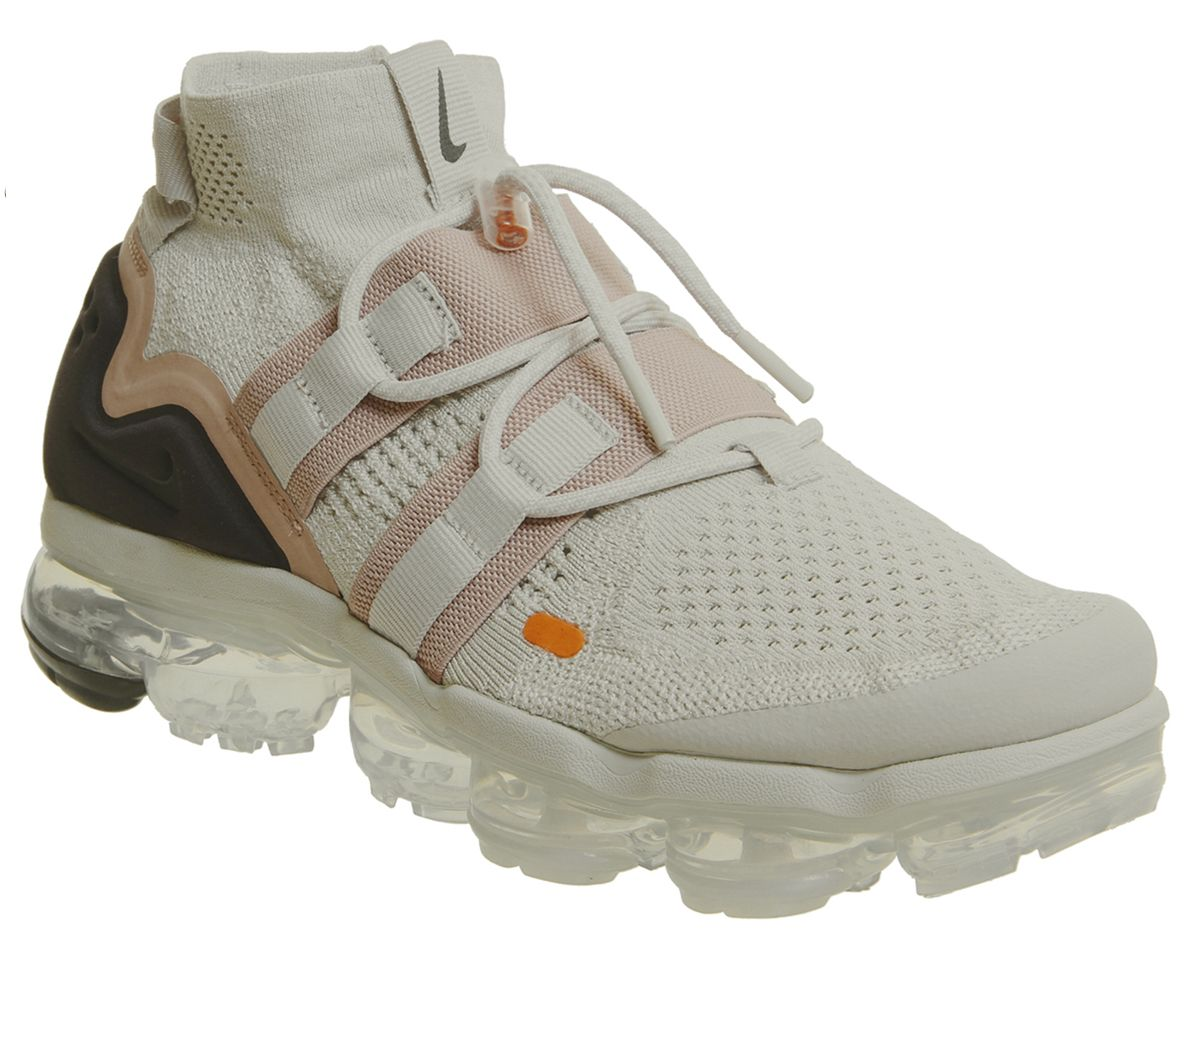 buy popular 2b717 11332 Nike Vapormax Air Vapormax Flyknit Utility Trainers Light ...